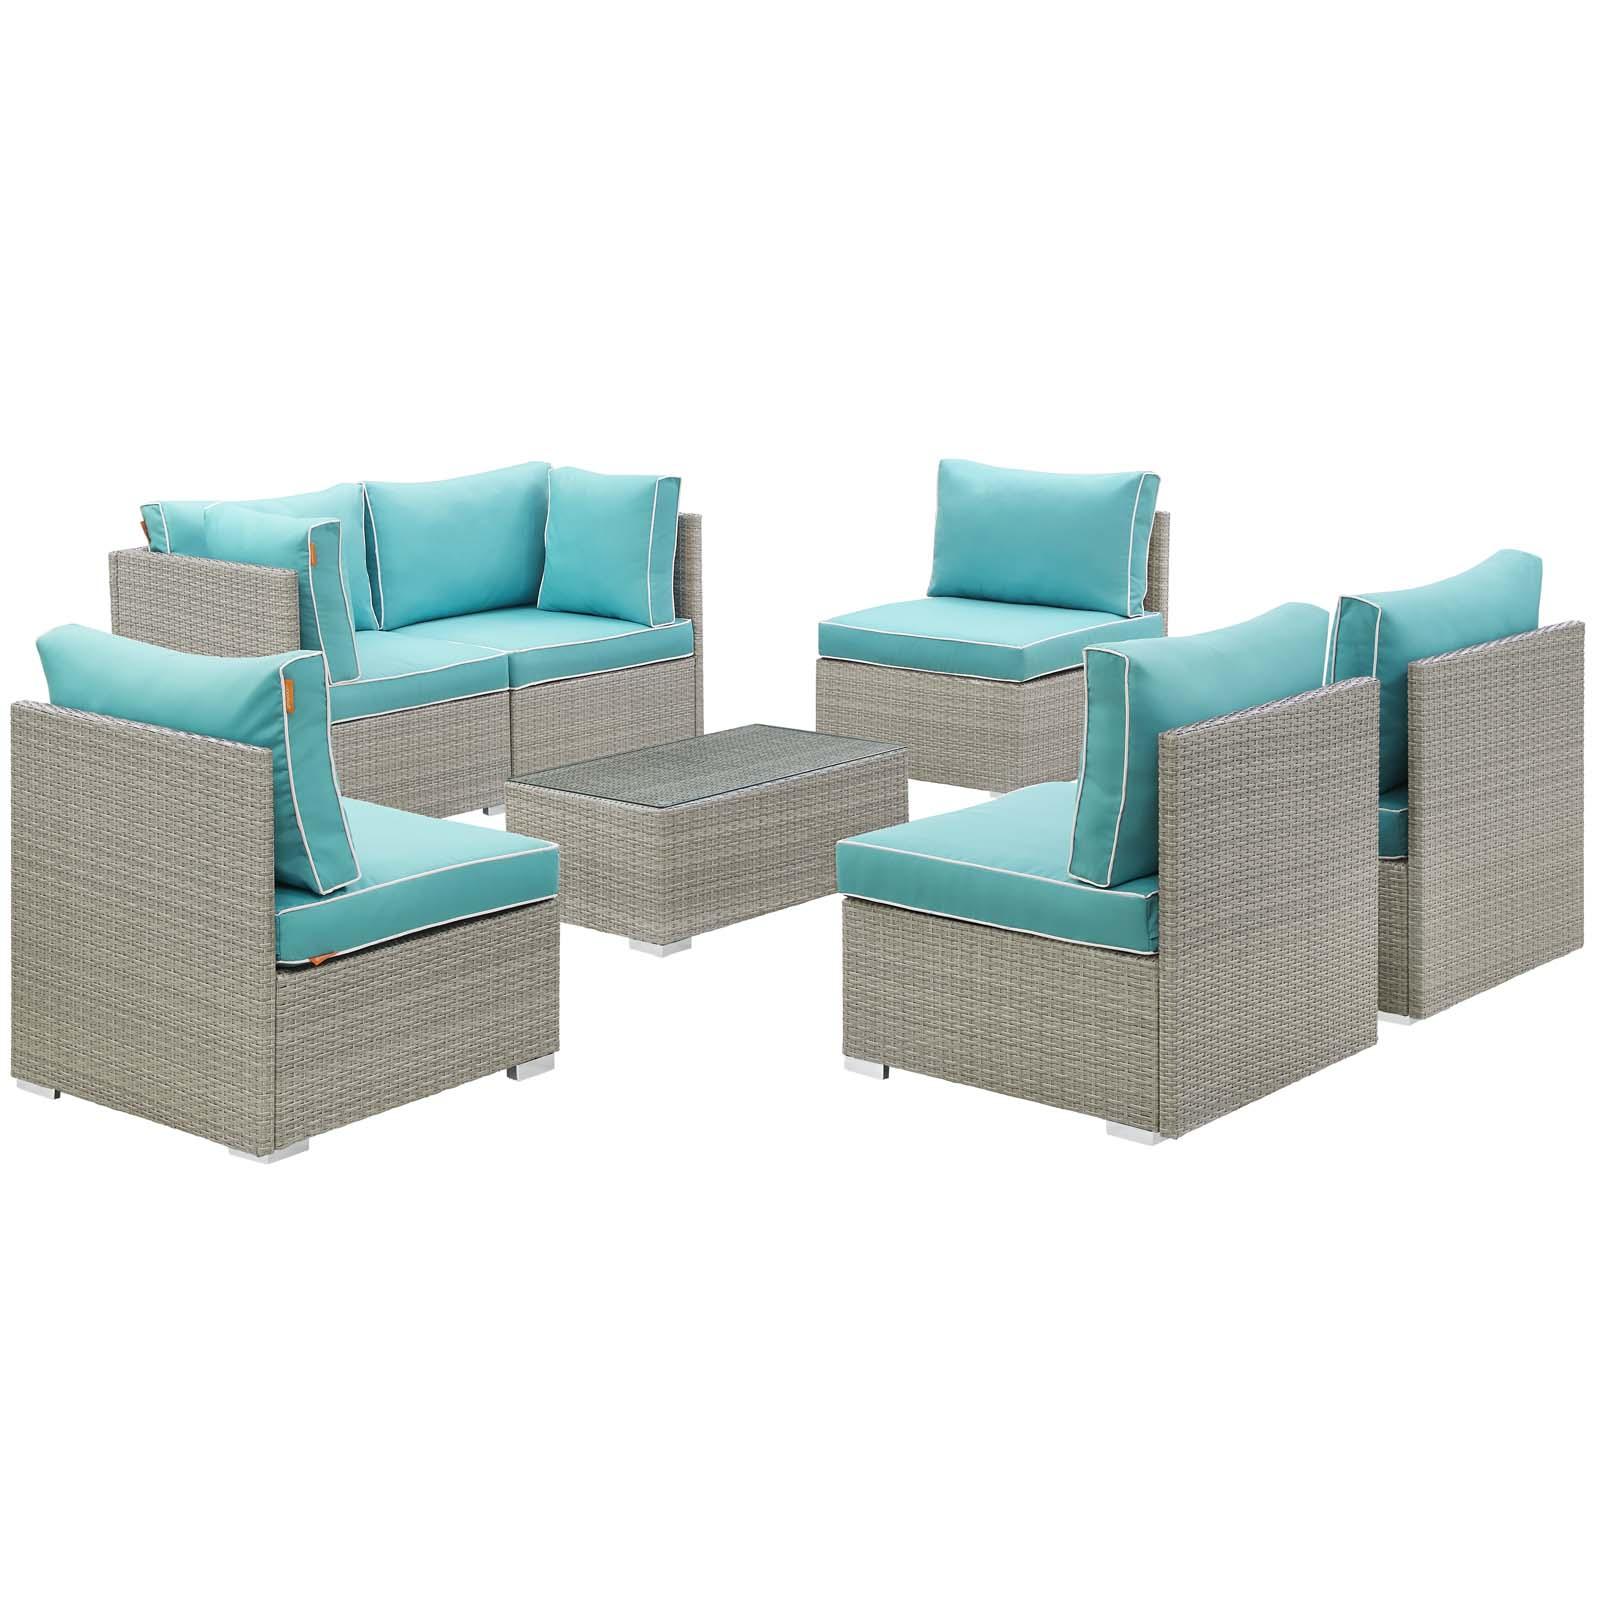 Modern Contemporary Urban Outdoor Patio Balcony Garden Furniture Lounge Sectional Sofa and Table Set, Sunbrella Rattan Wicker, Blue Light Gray